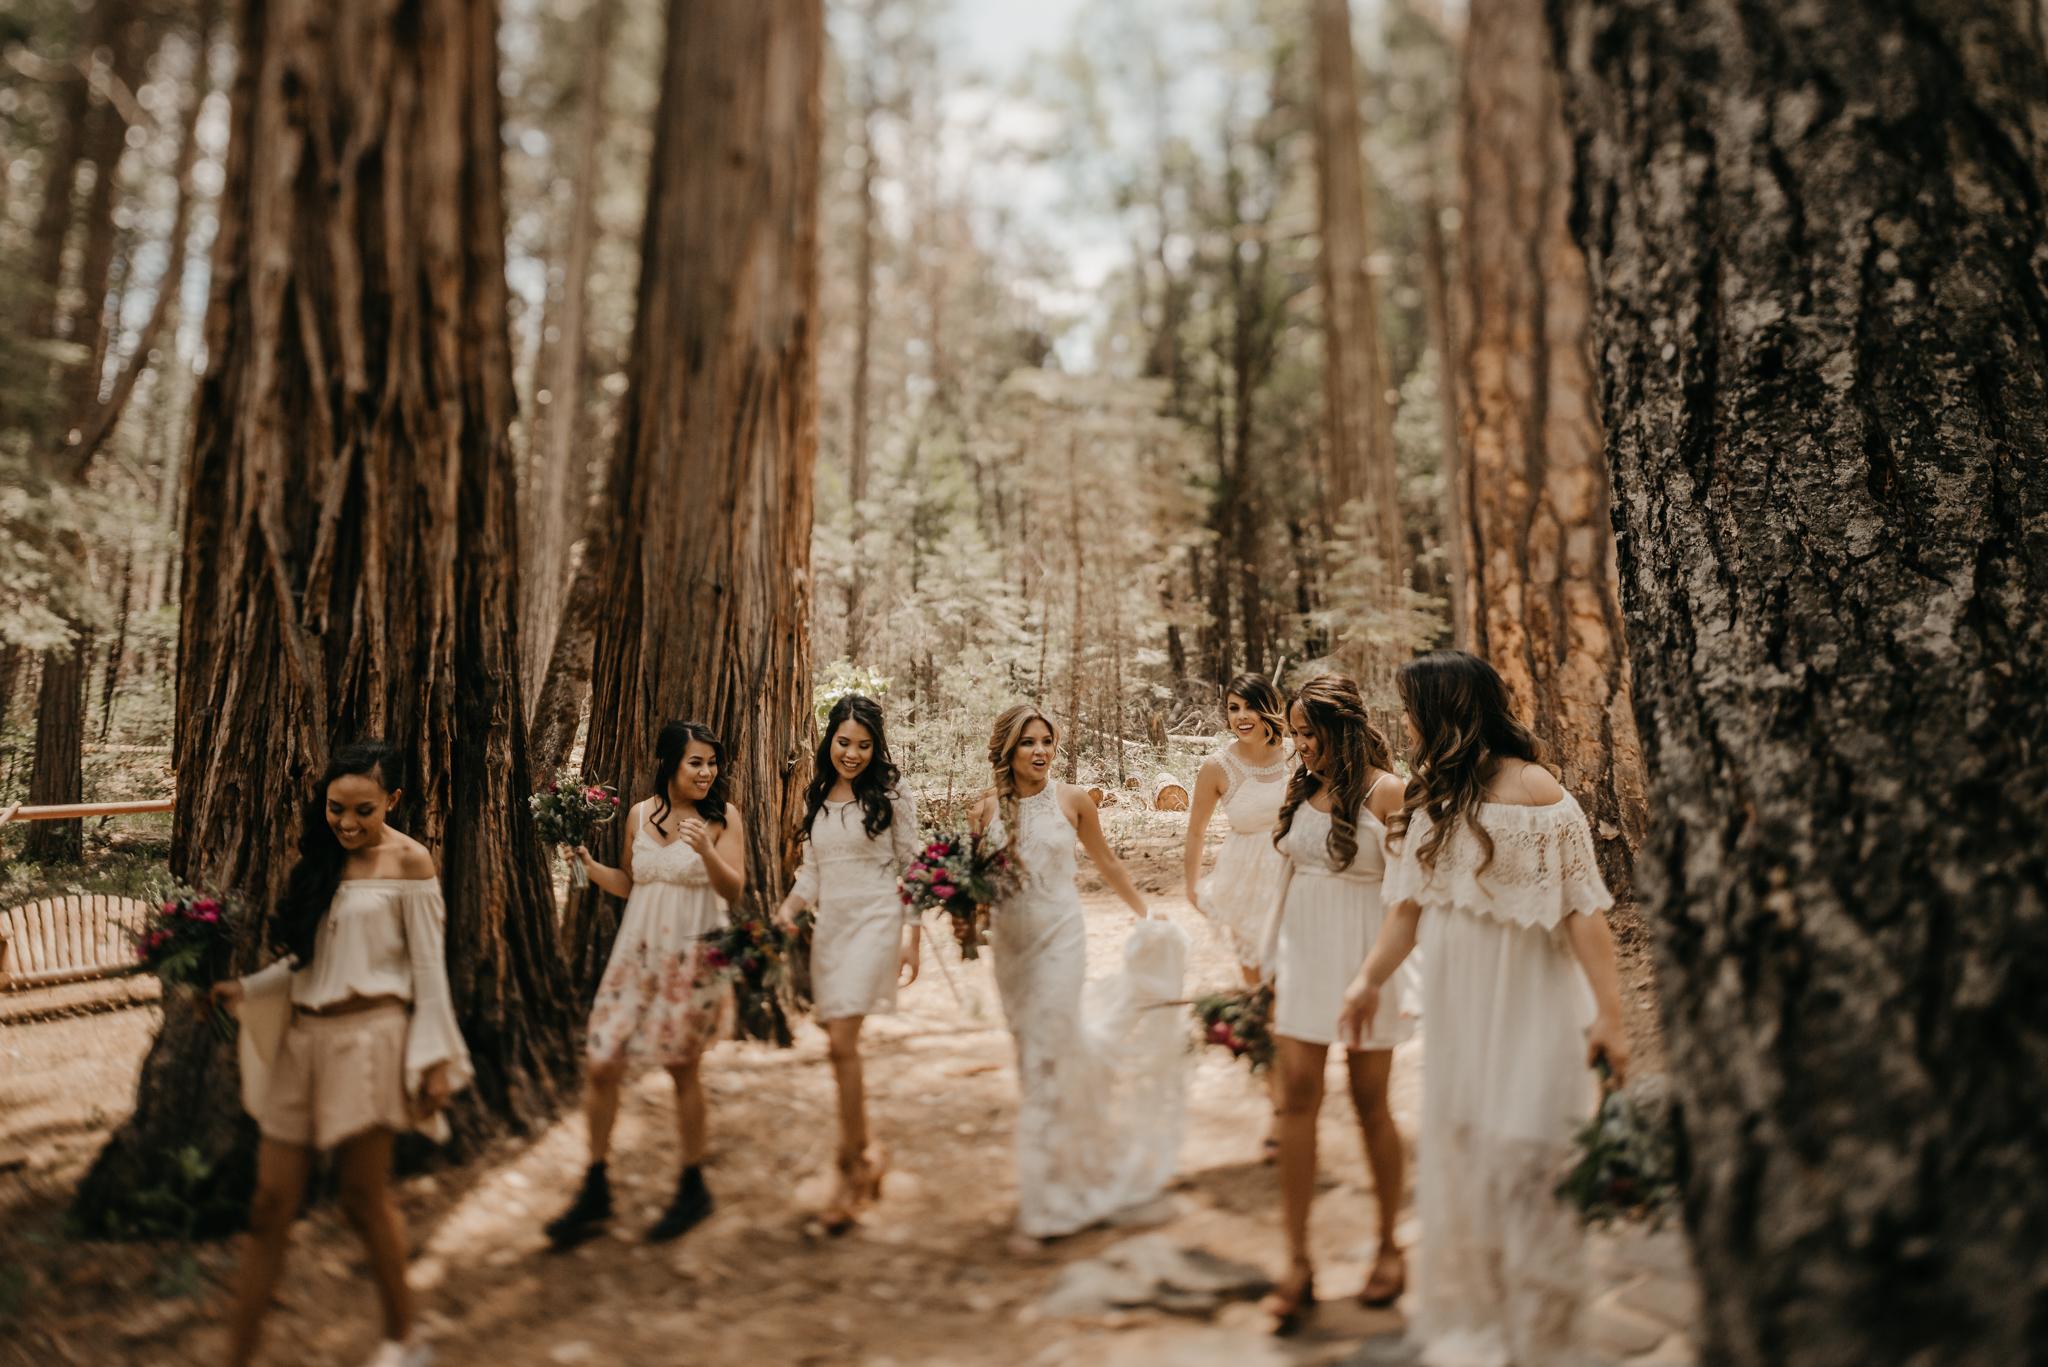 © Isaiah + Taylor Photography - Evergreen Lodge Destination Yoesmite Wedding - Los Angeles Wedding Photographer-055.jpg